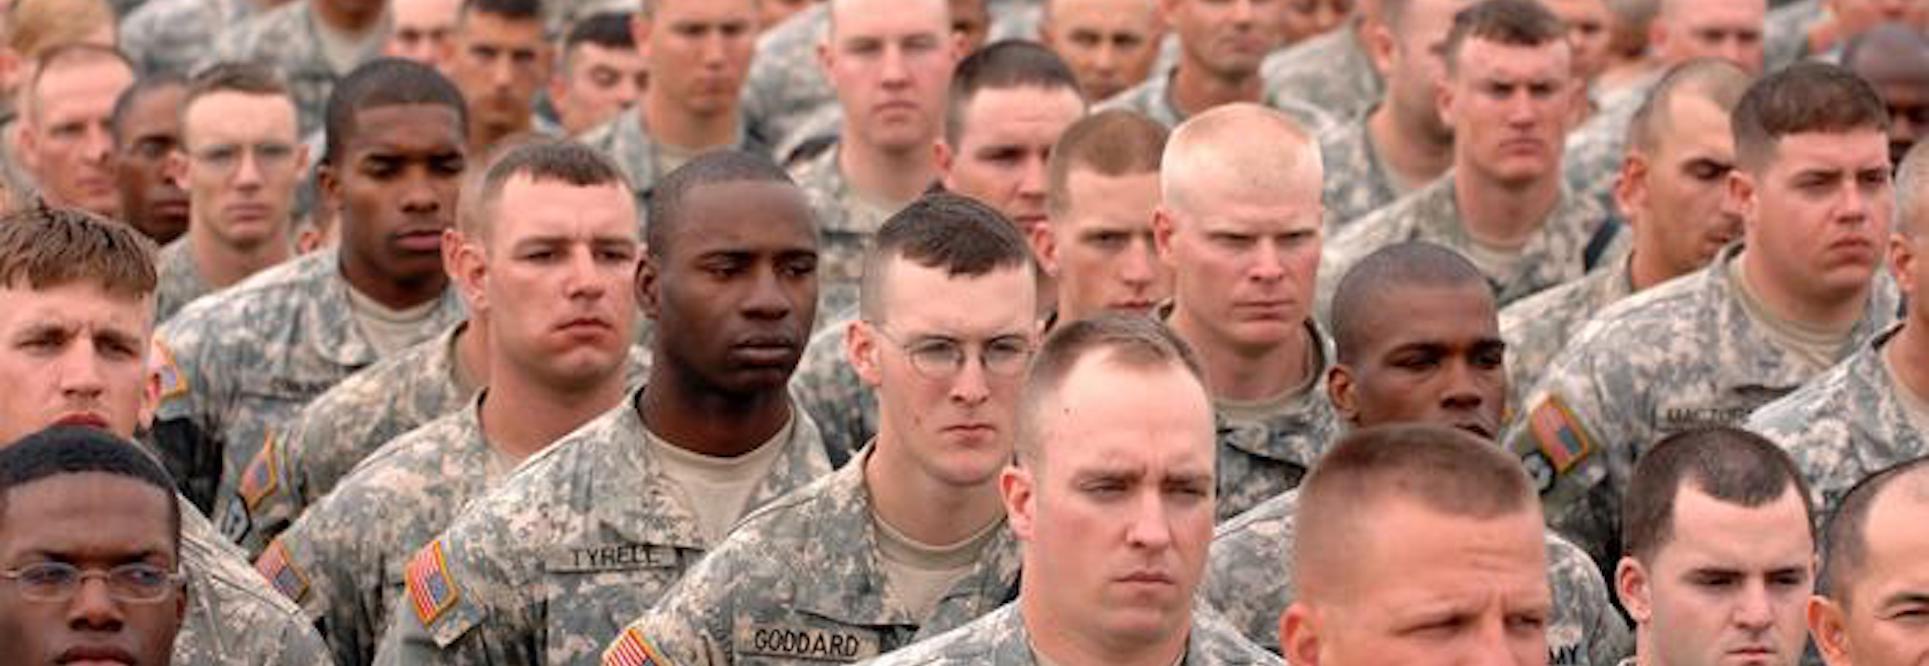 Soldier but not citizen